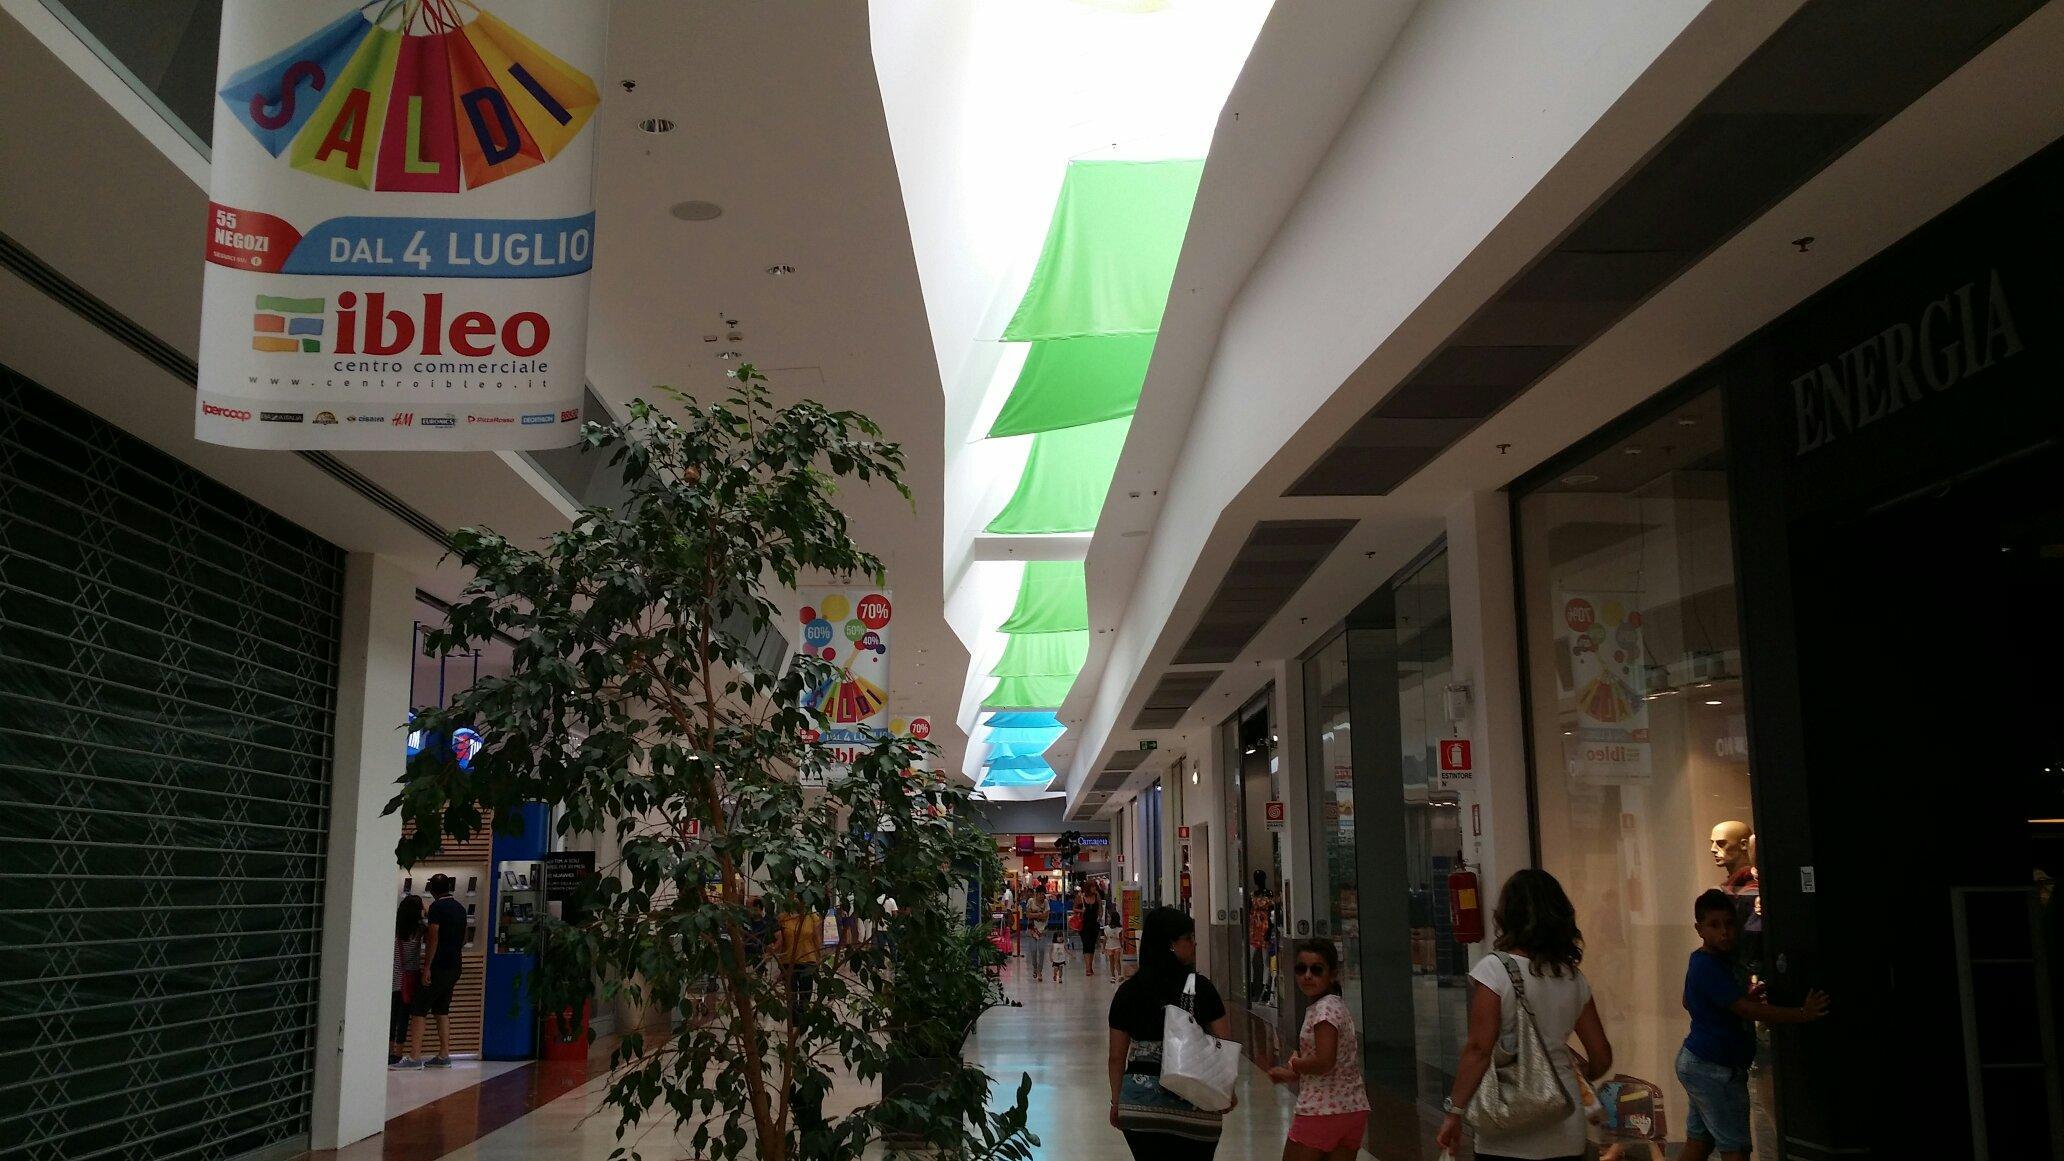 Centro Commerciale Ibleo